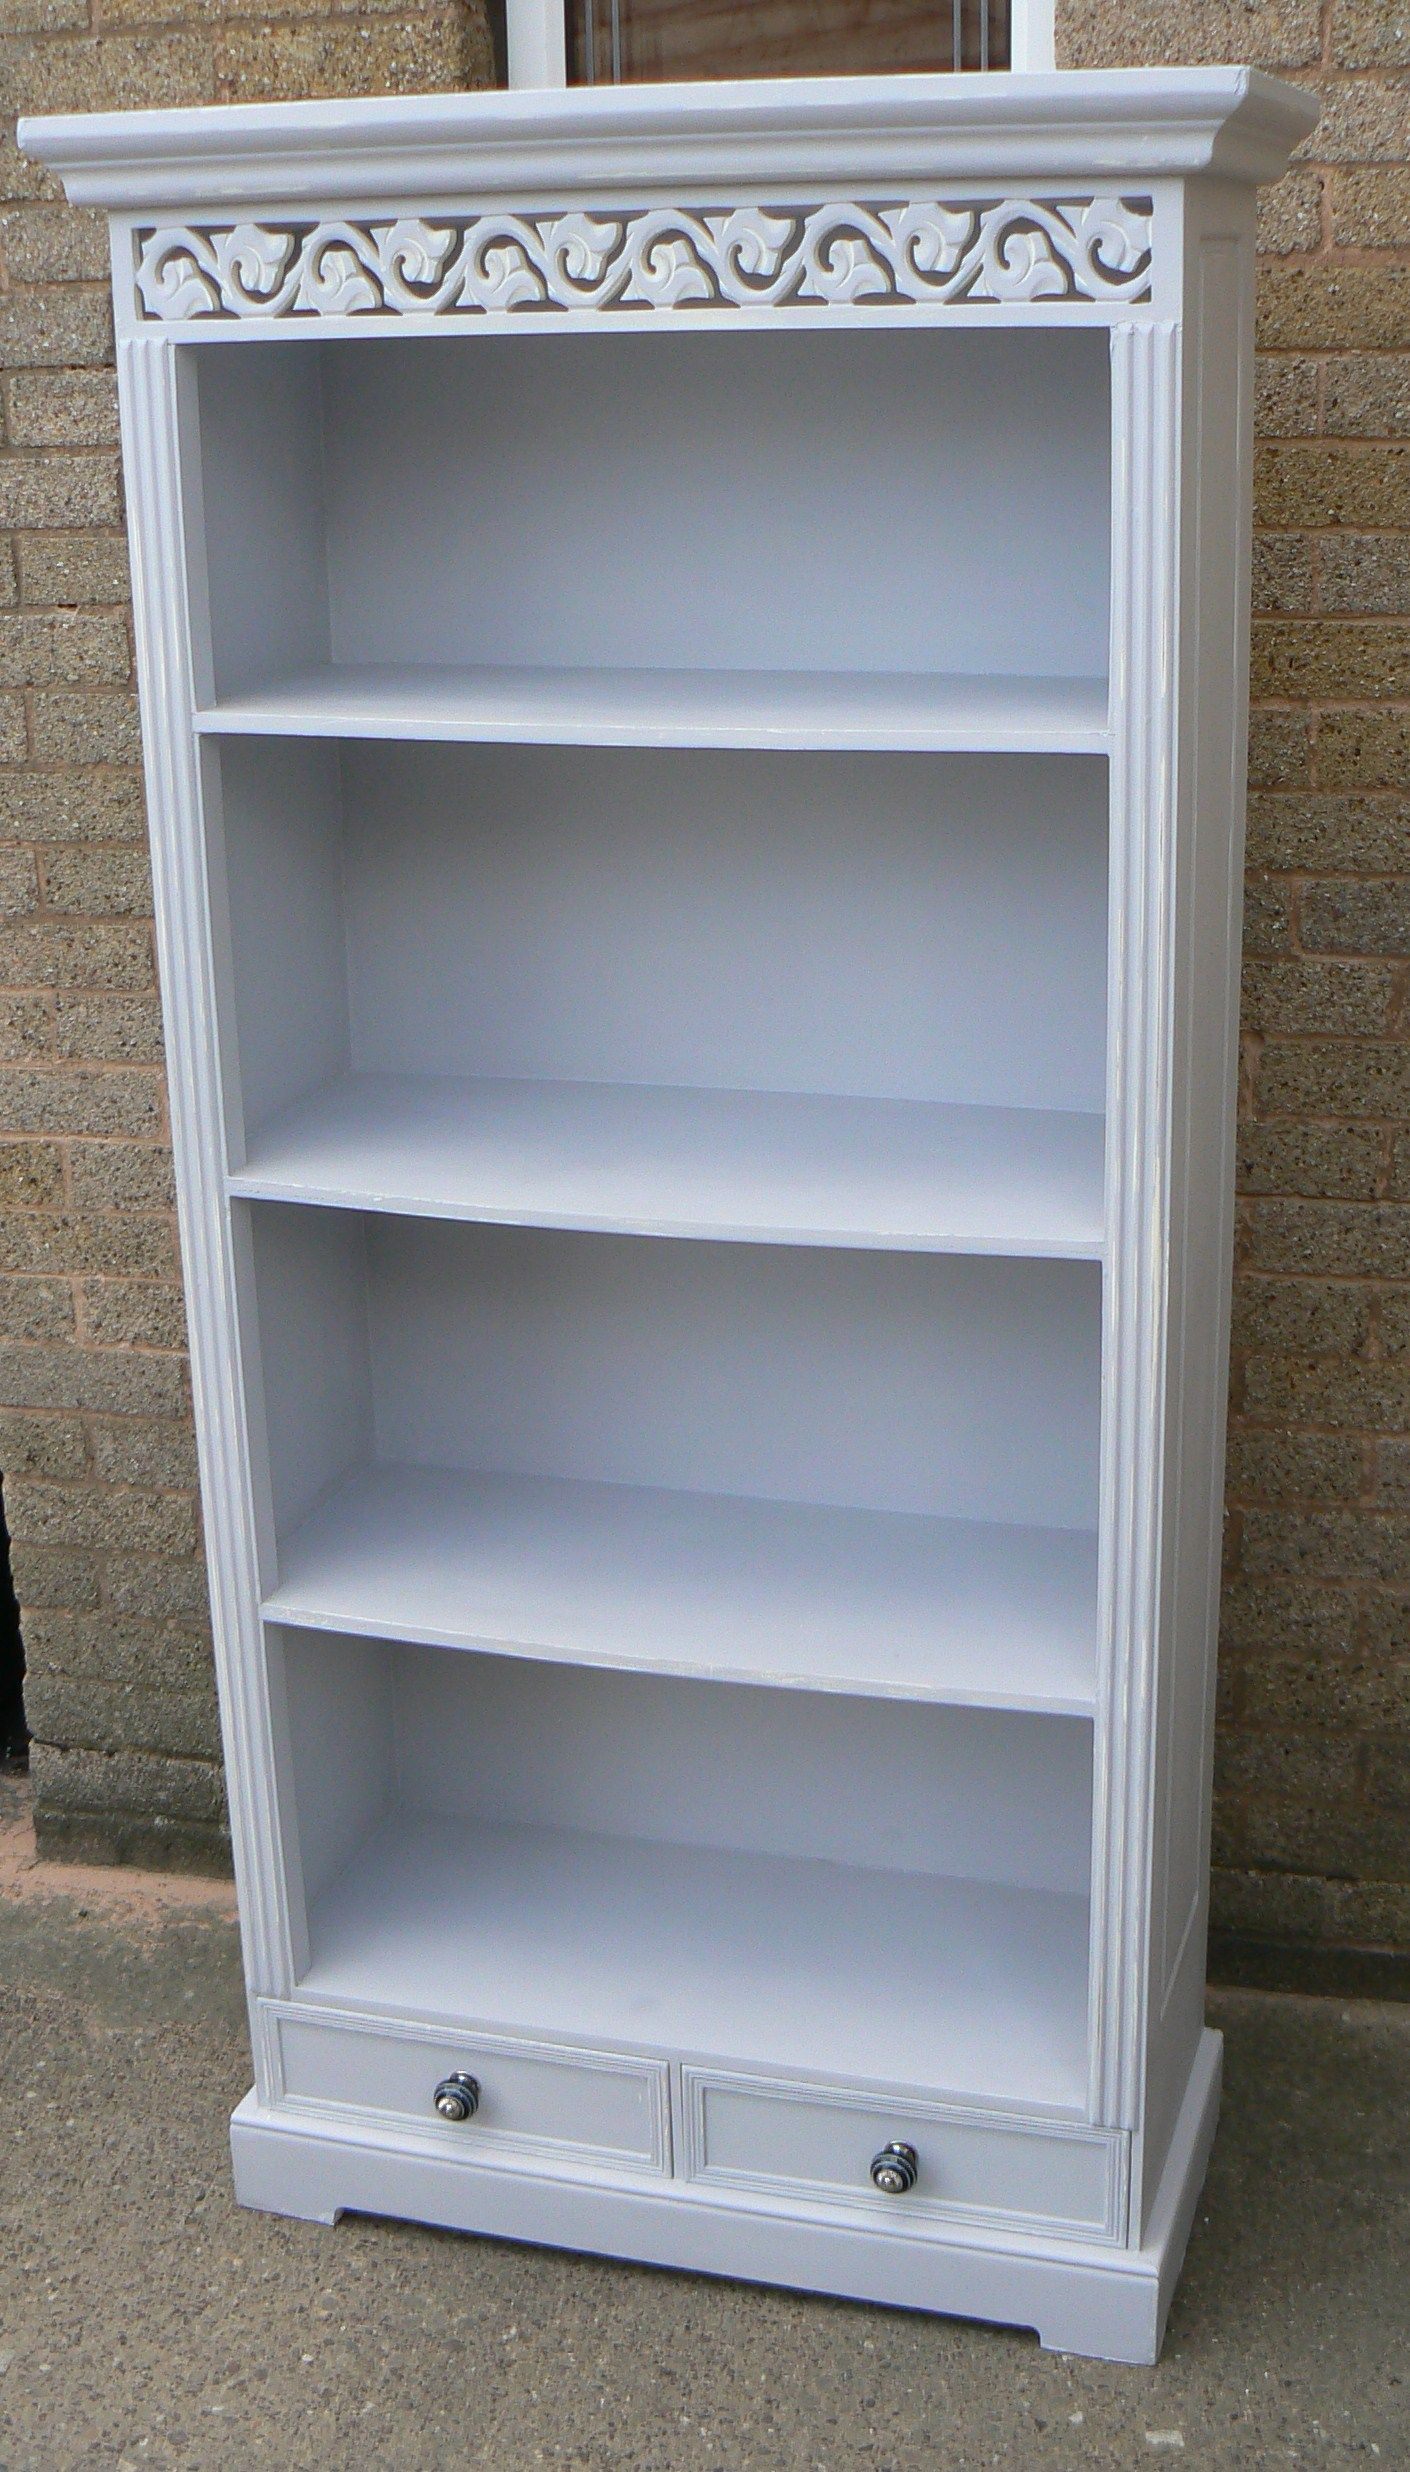 Bookcase in Autentico #Cement #chalkpaint   Furniture   Pinterest ...